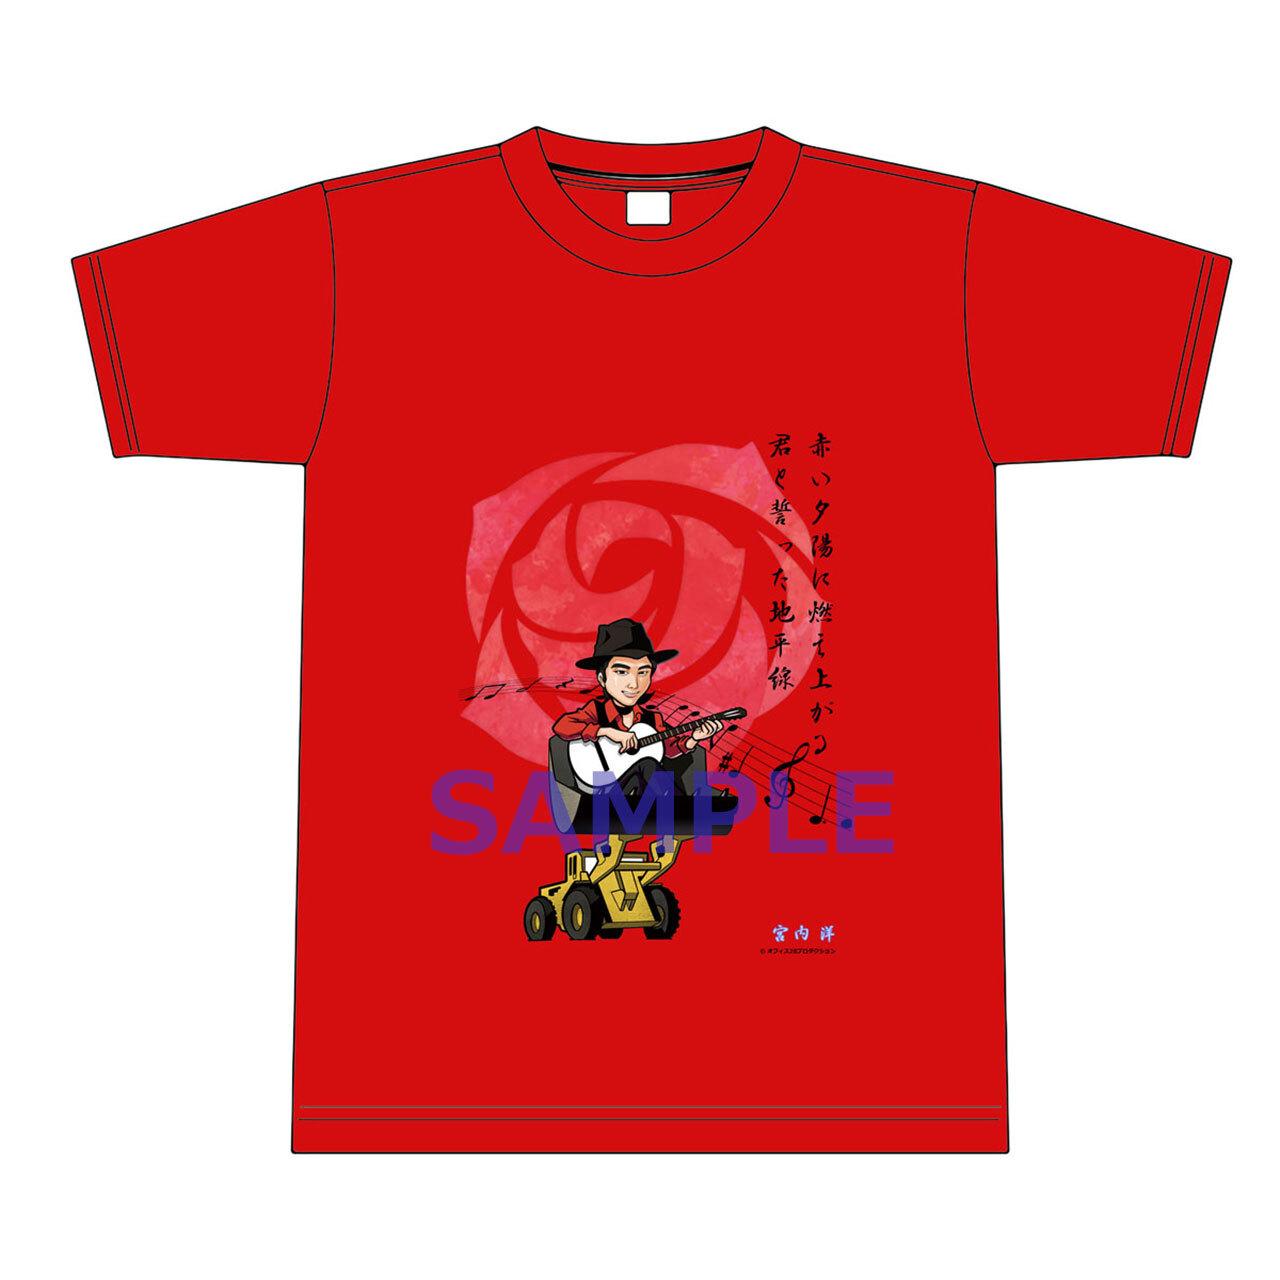 【4589839361330先】宮内洋 Tシャツ A /XXL